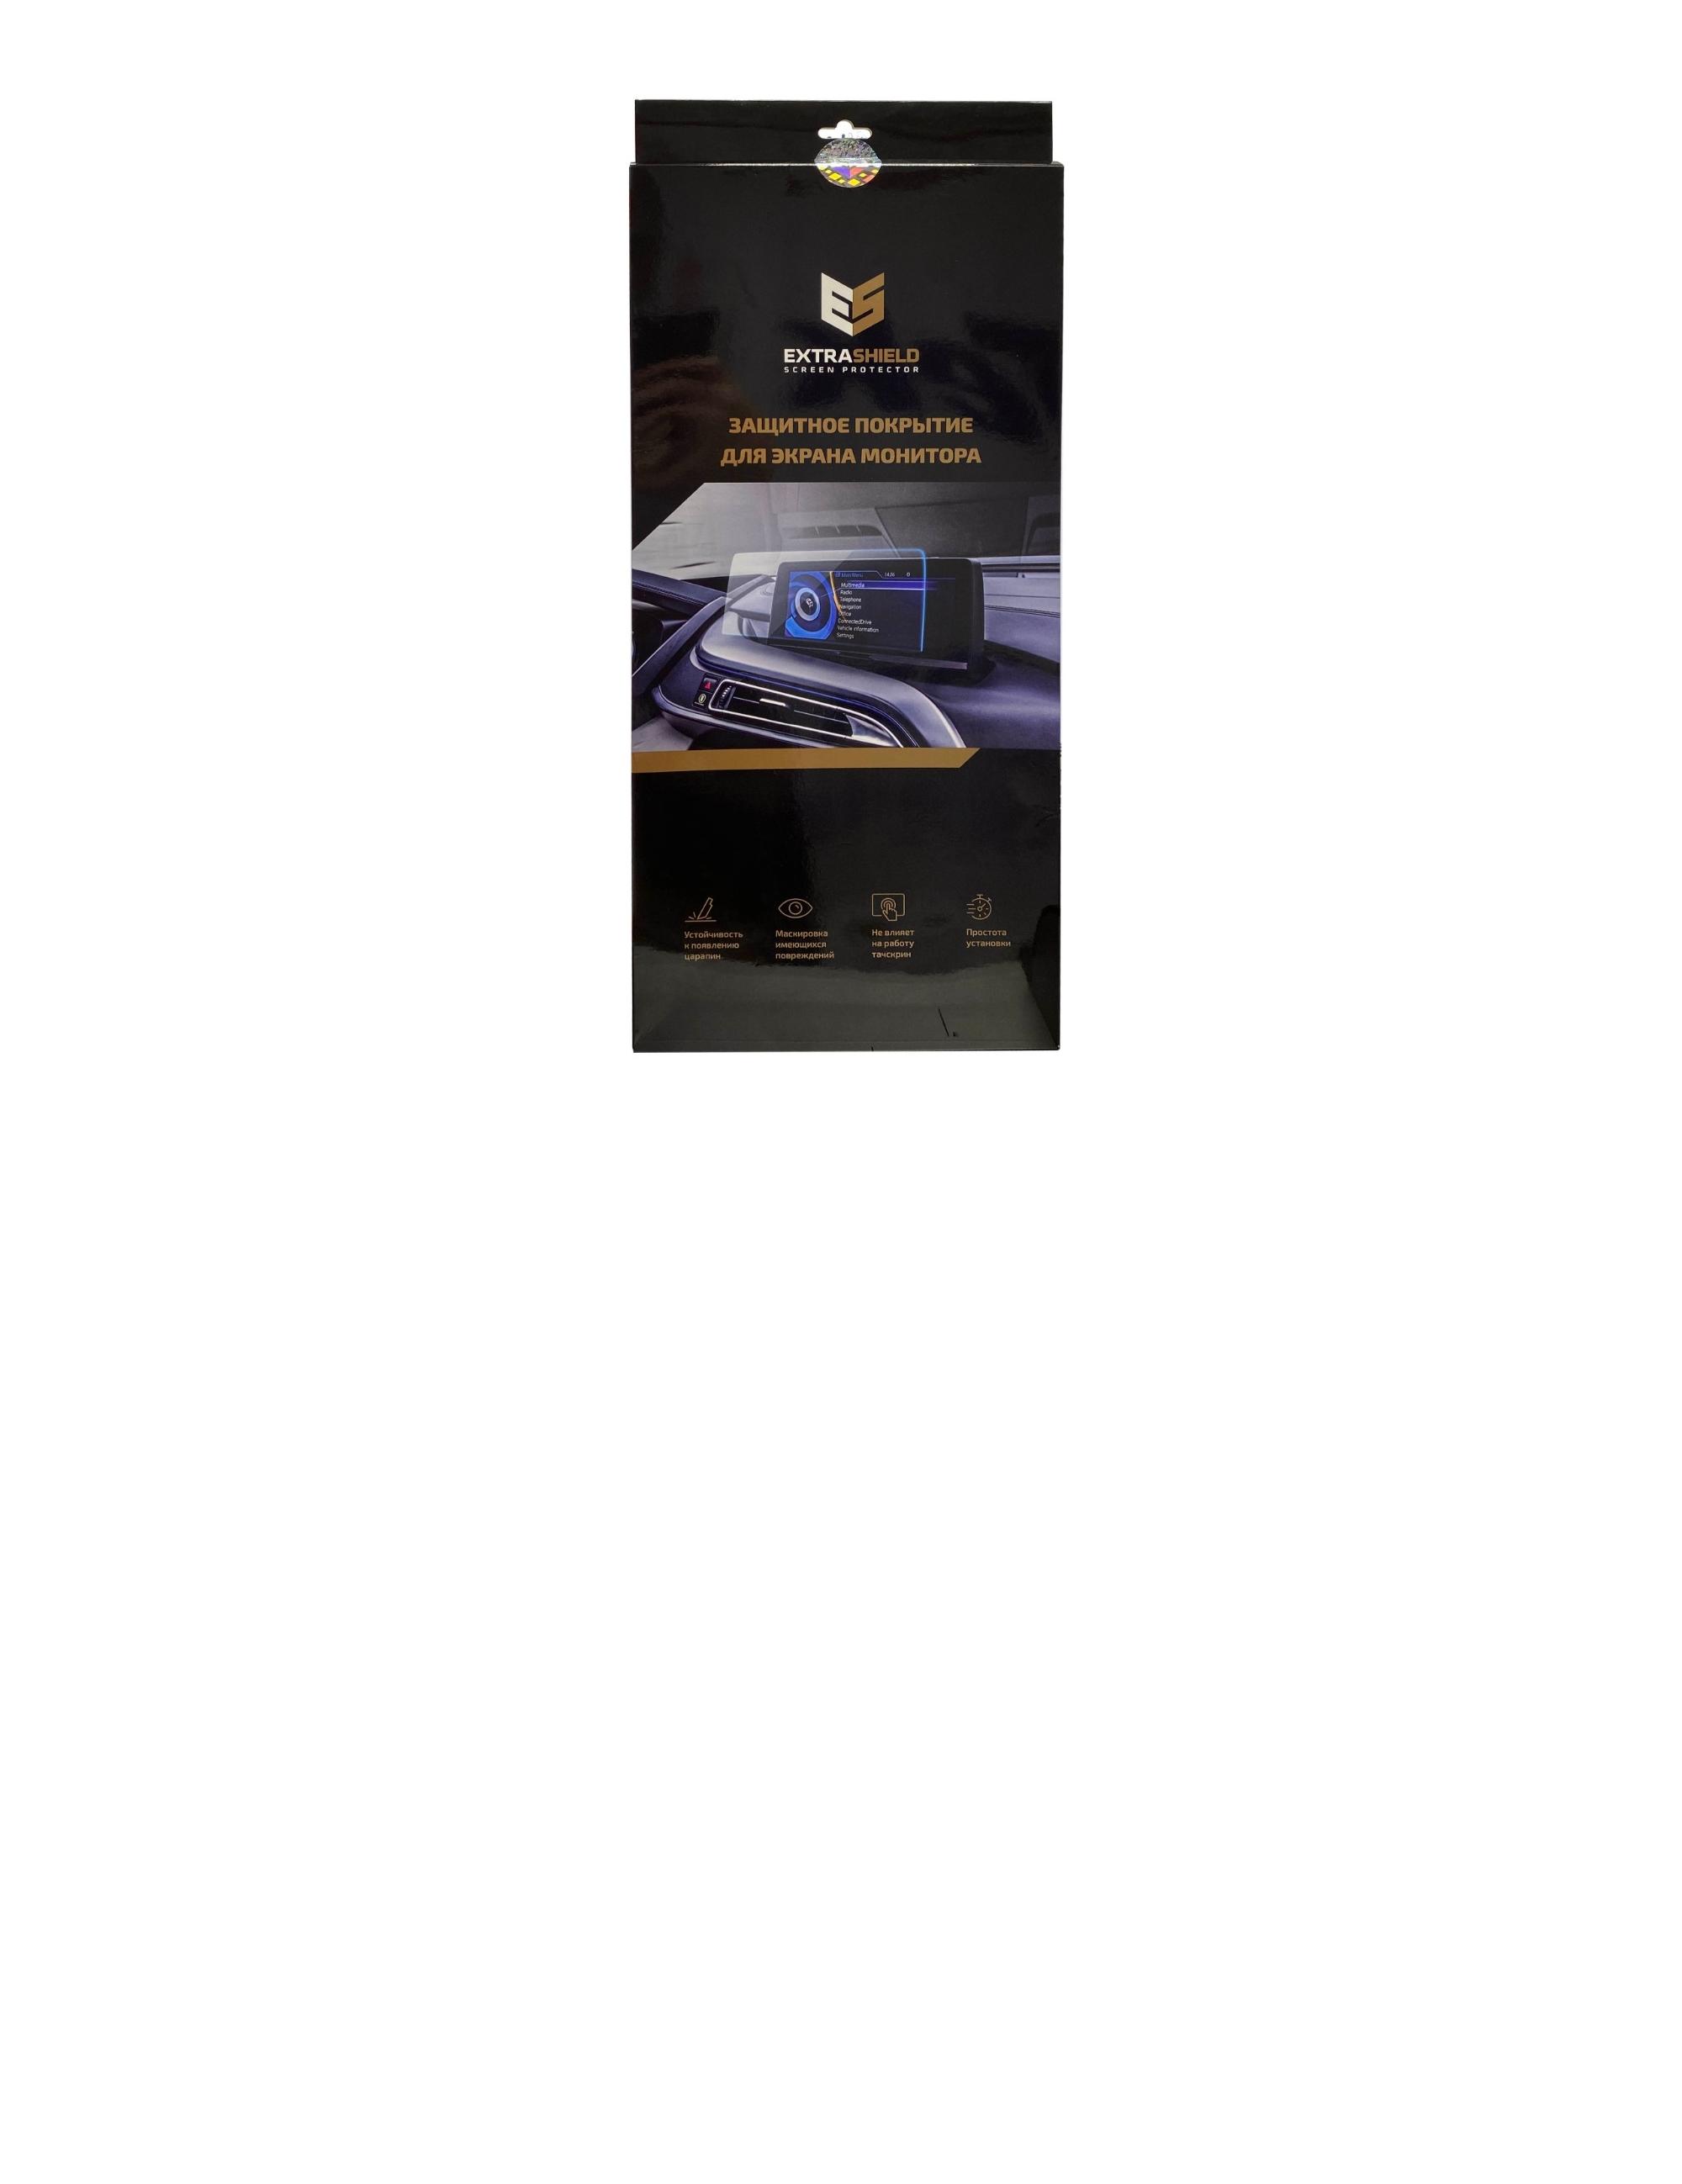 Land Rover Range Rover Sport 2013 - 2017 мультимедиа 10.2 Защитное стекло Матовая